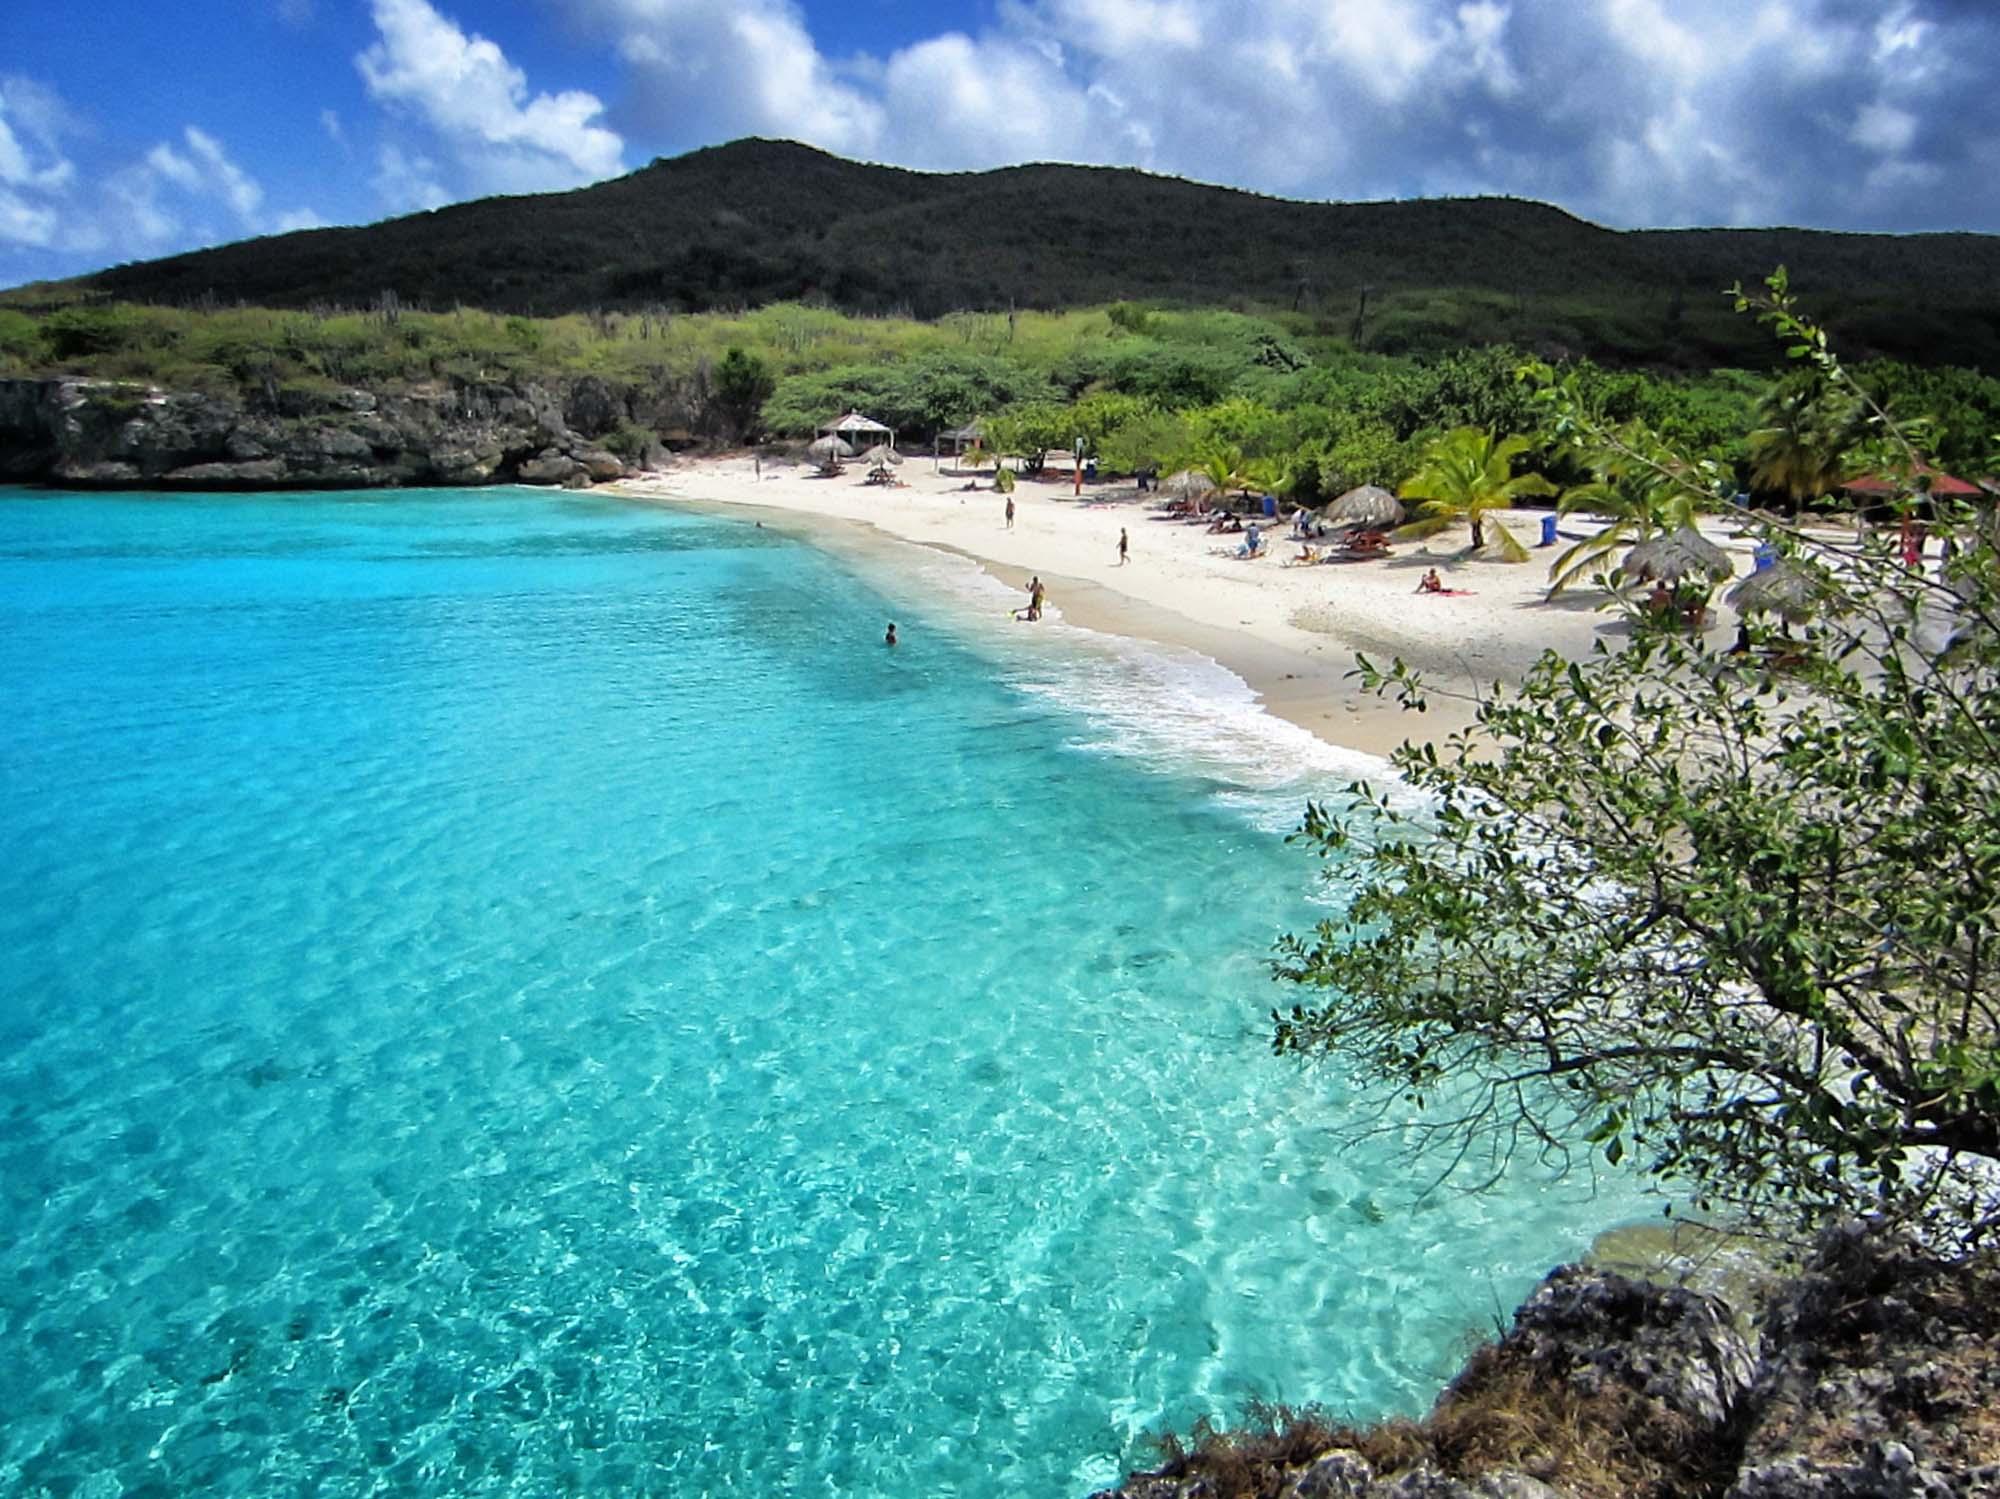 mooiste stranden van Curaçao knip beach